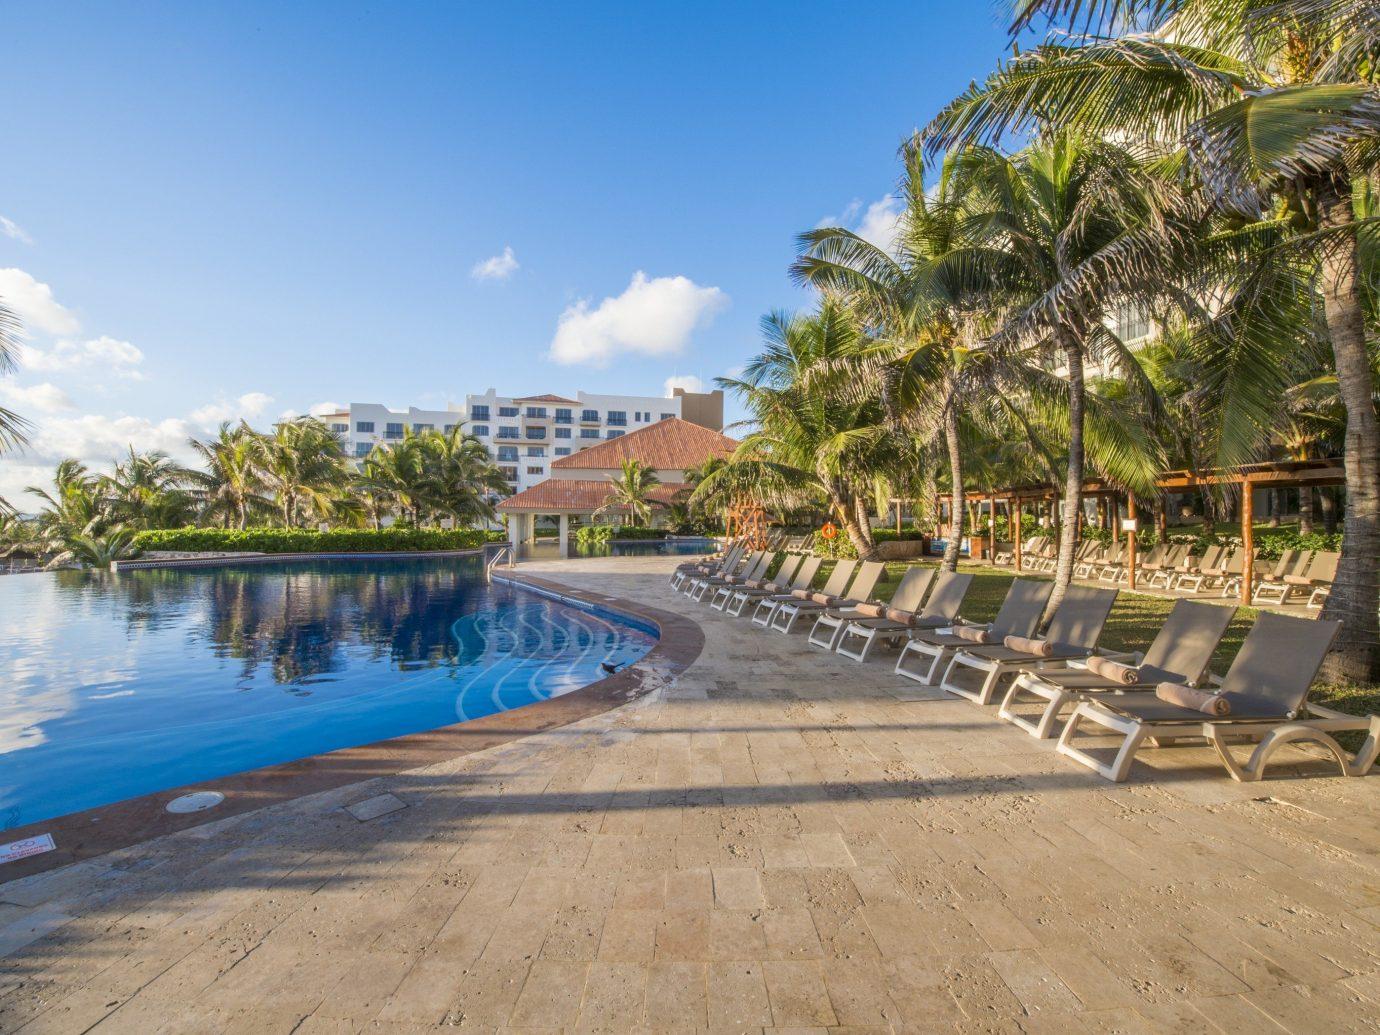 View of pool at Fiesta Americana Condesa Cancun